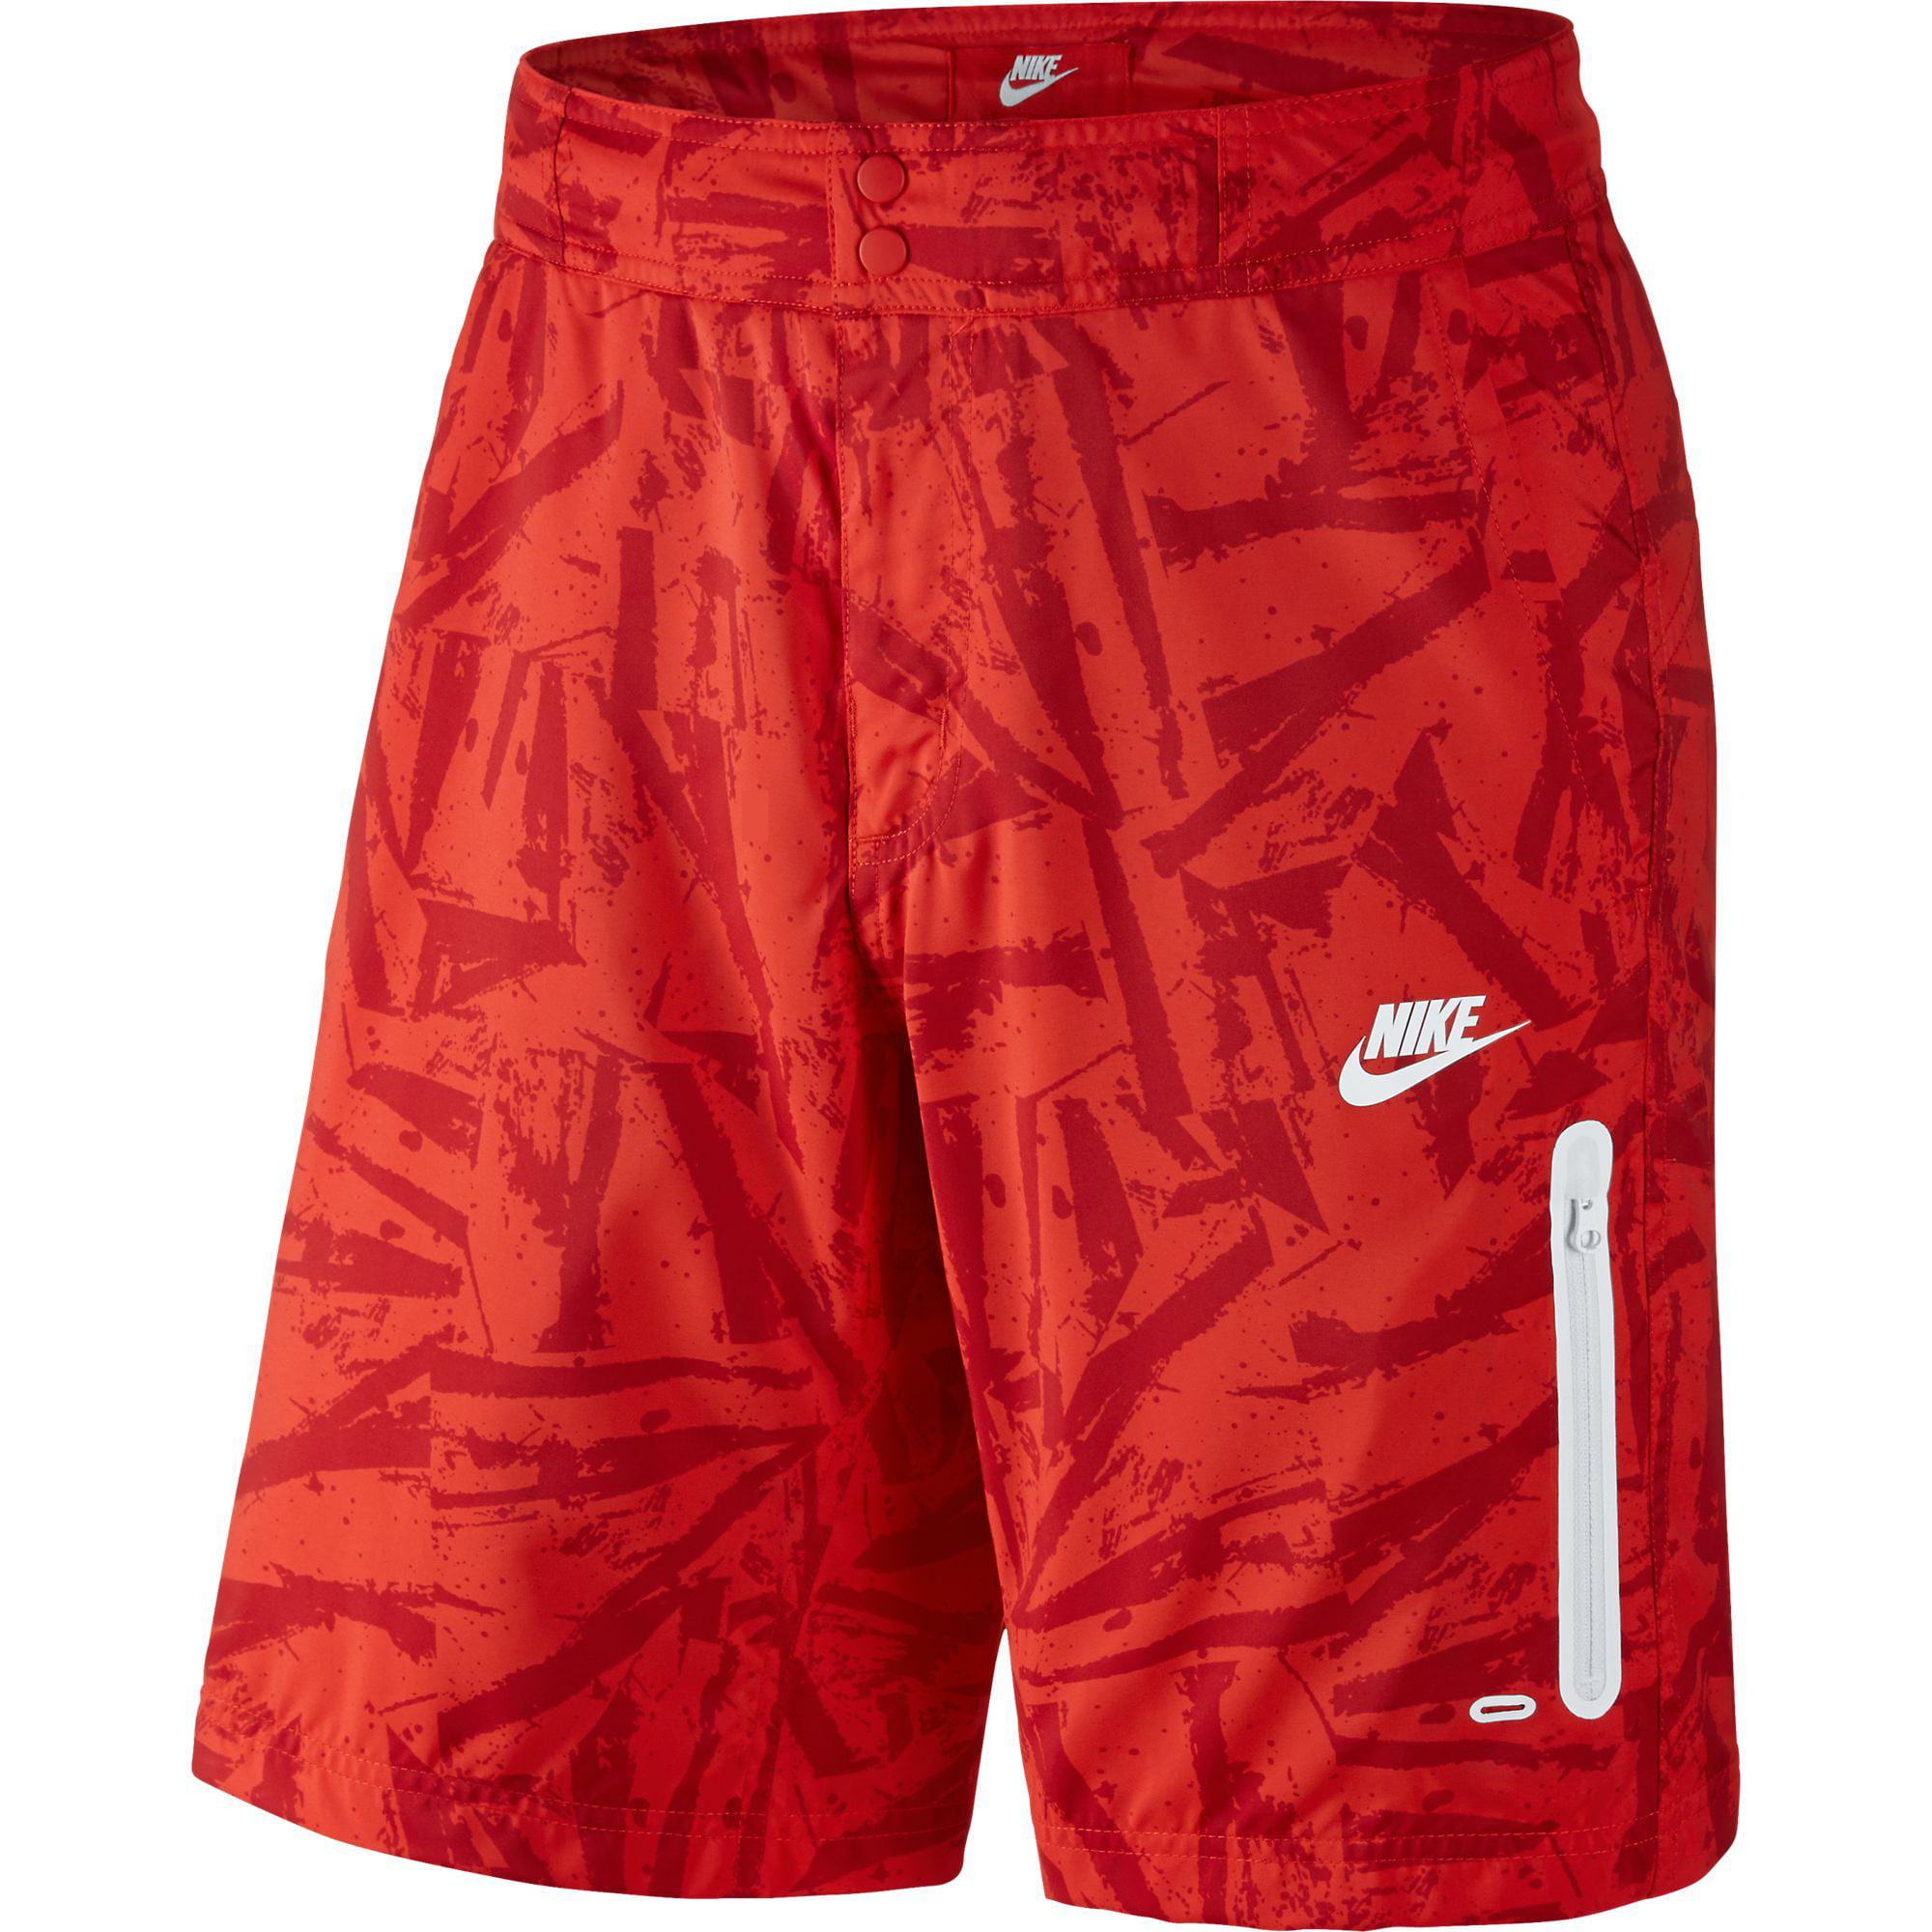 Nike Prodigy Summer Solstice Men